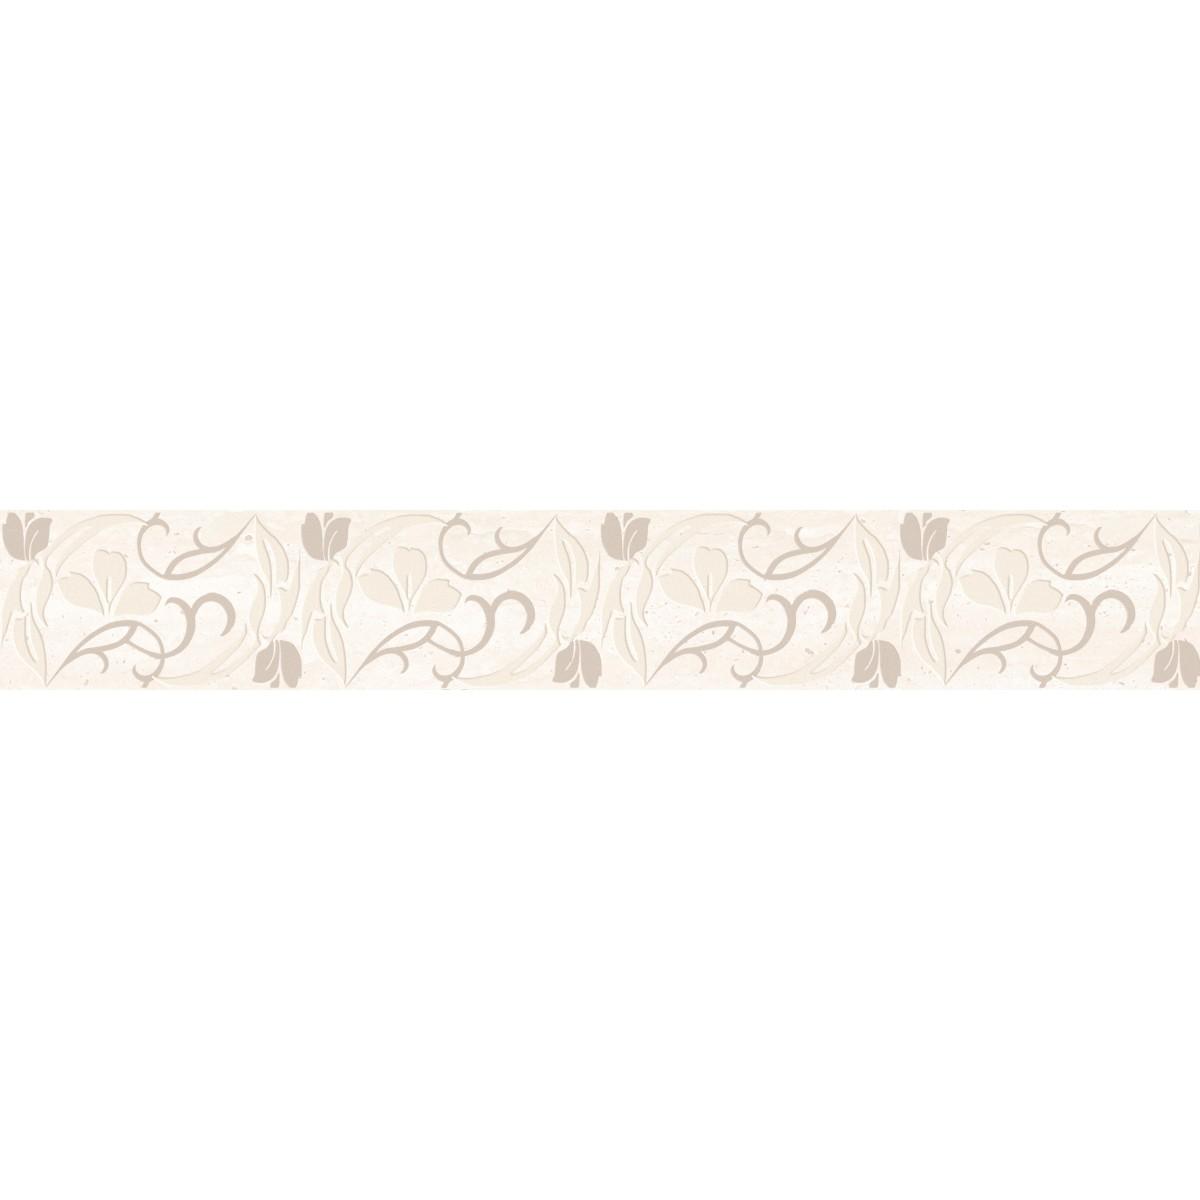 Бордюр «Кастельон» 60х90 см цвет бежевый